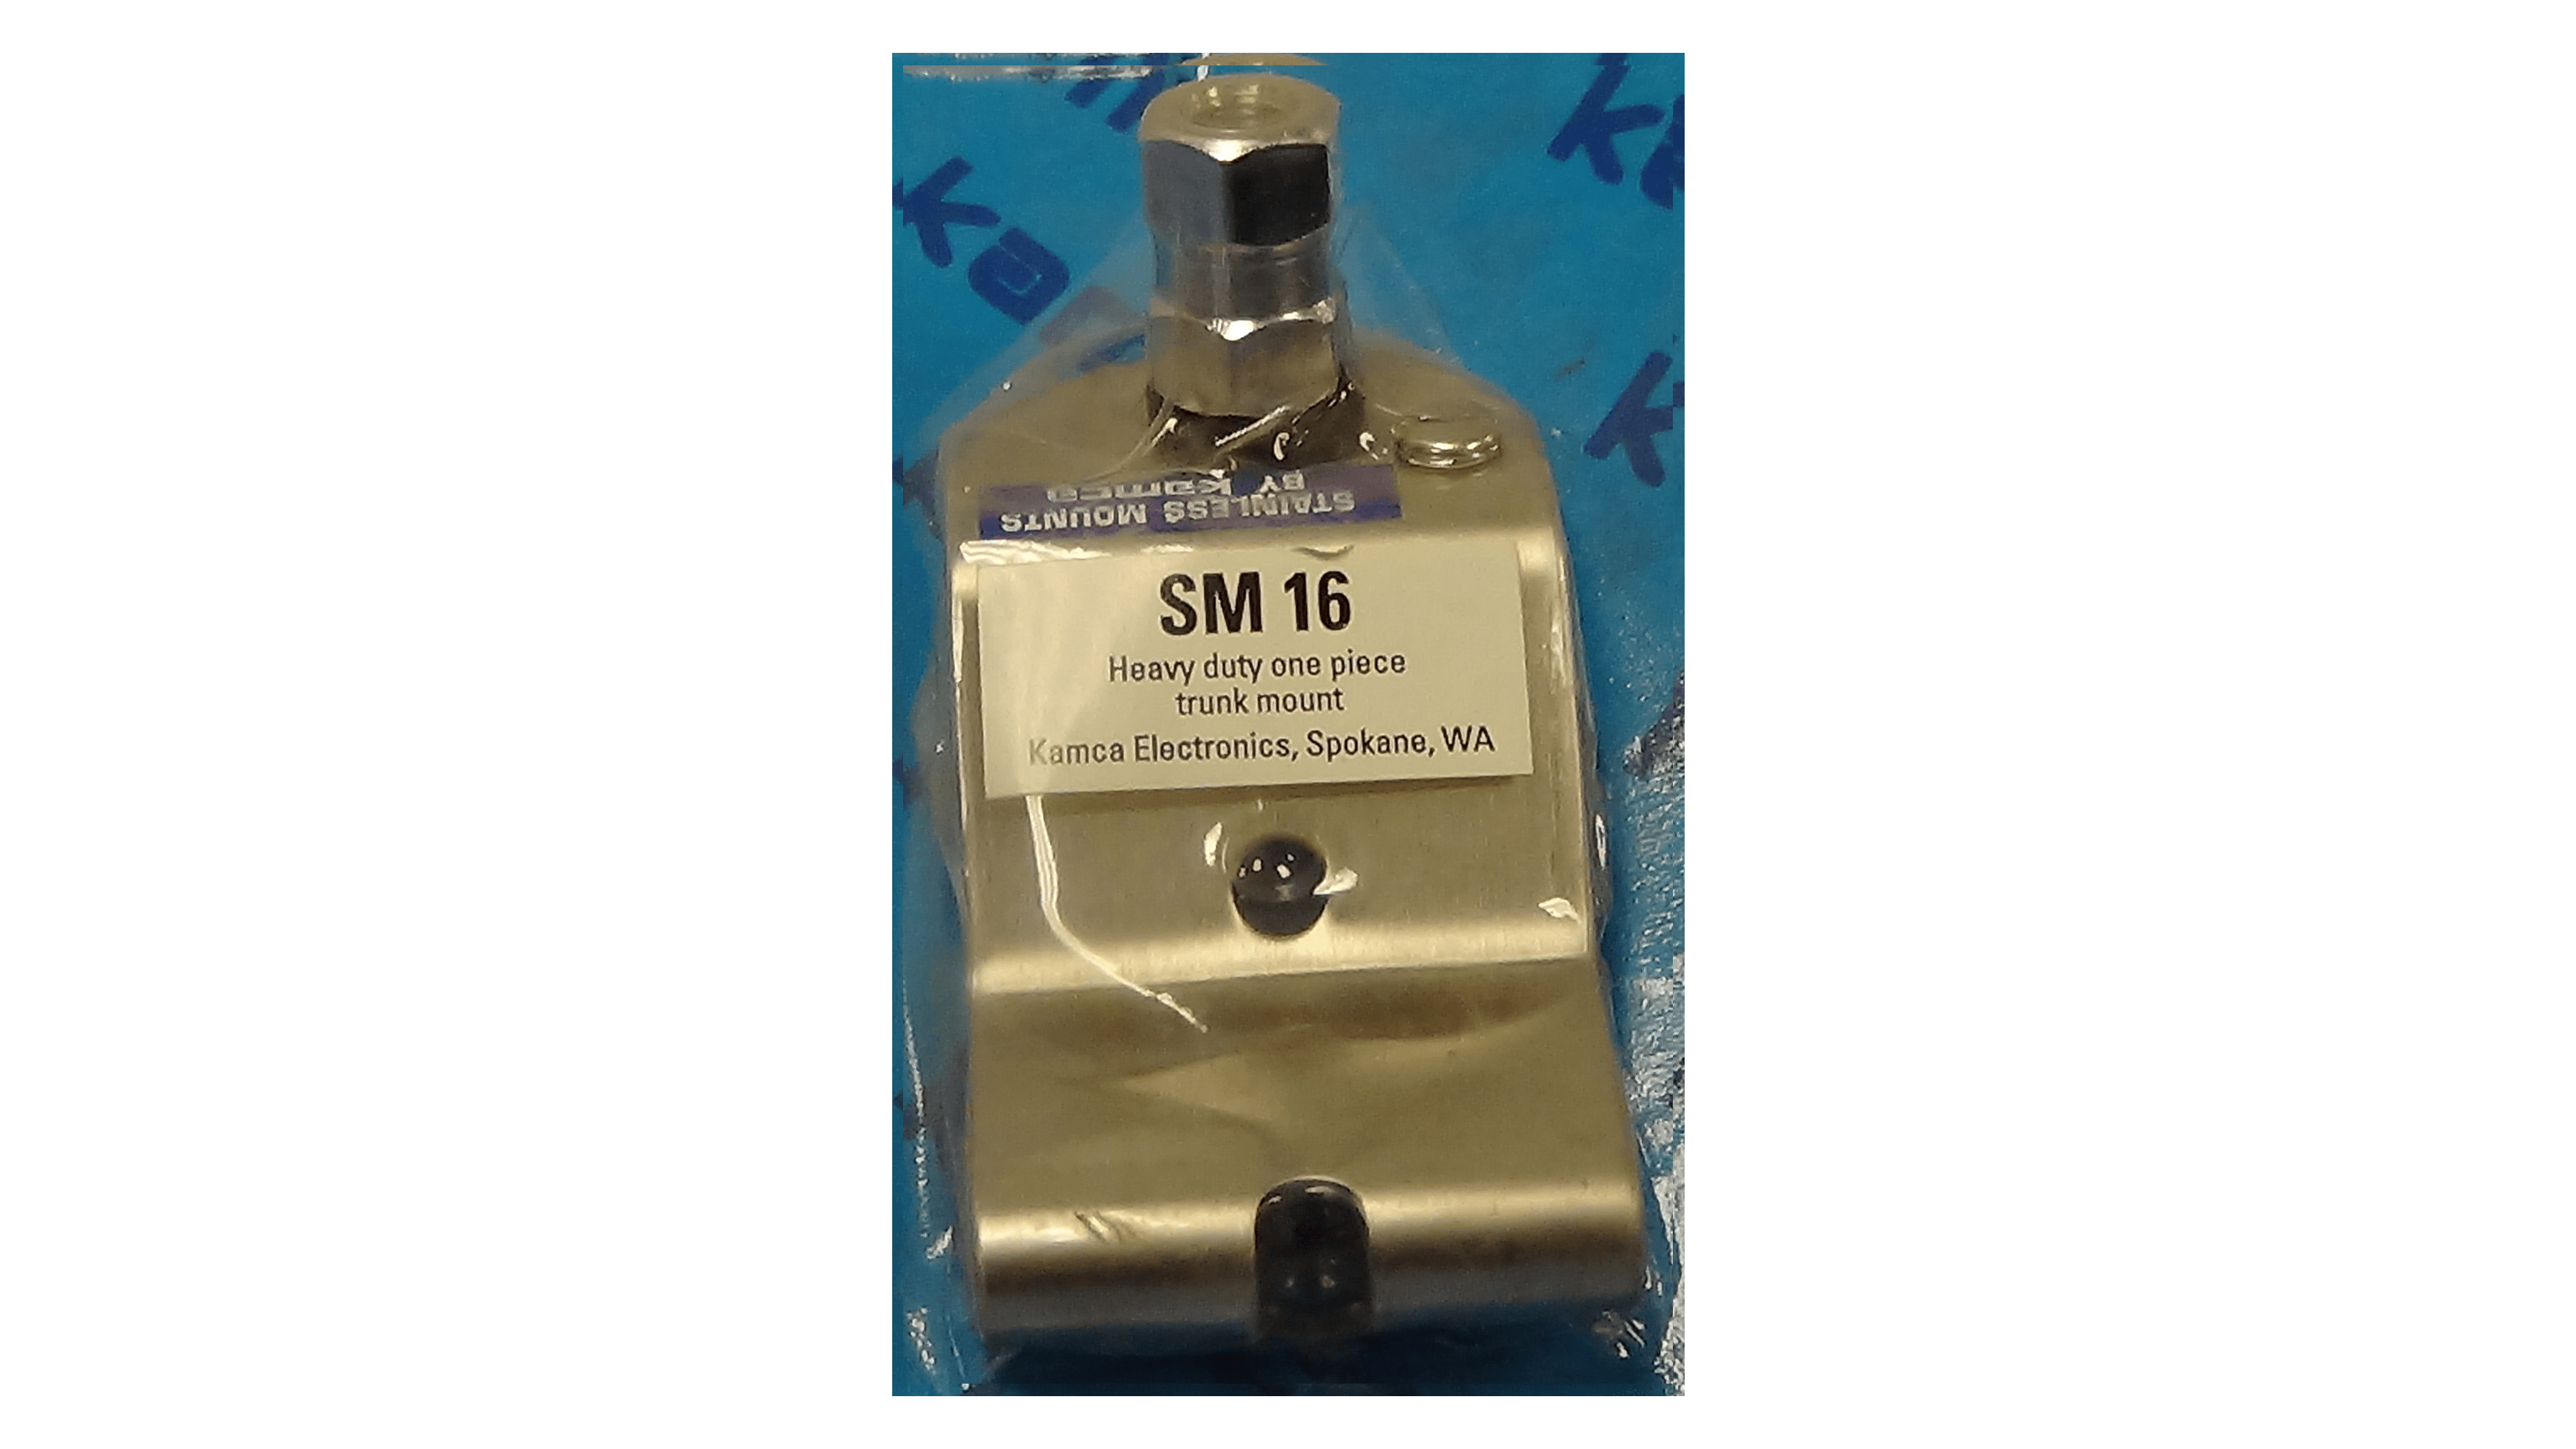 SM16 - One Piece Trunk Antenna Mount